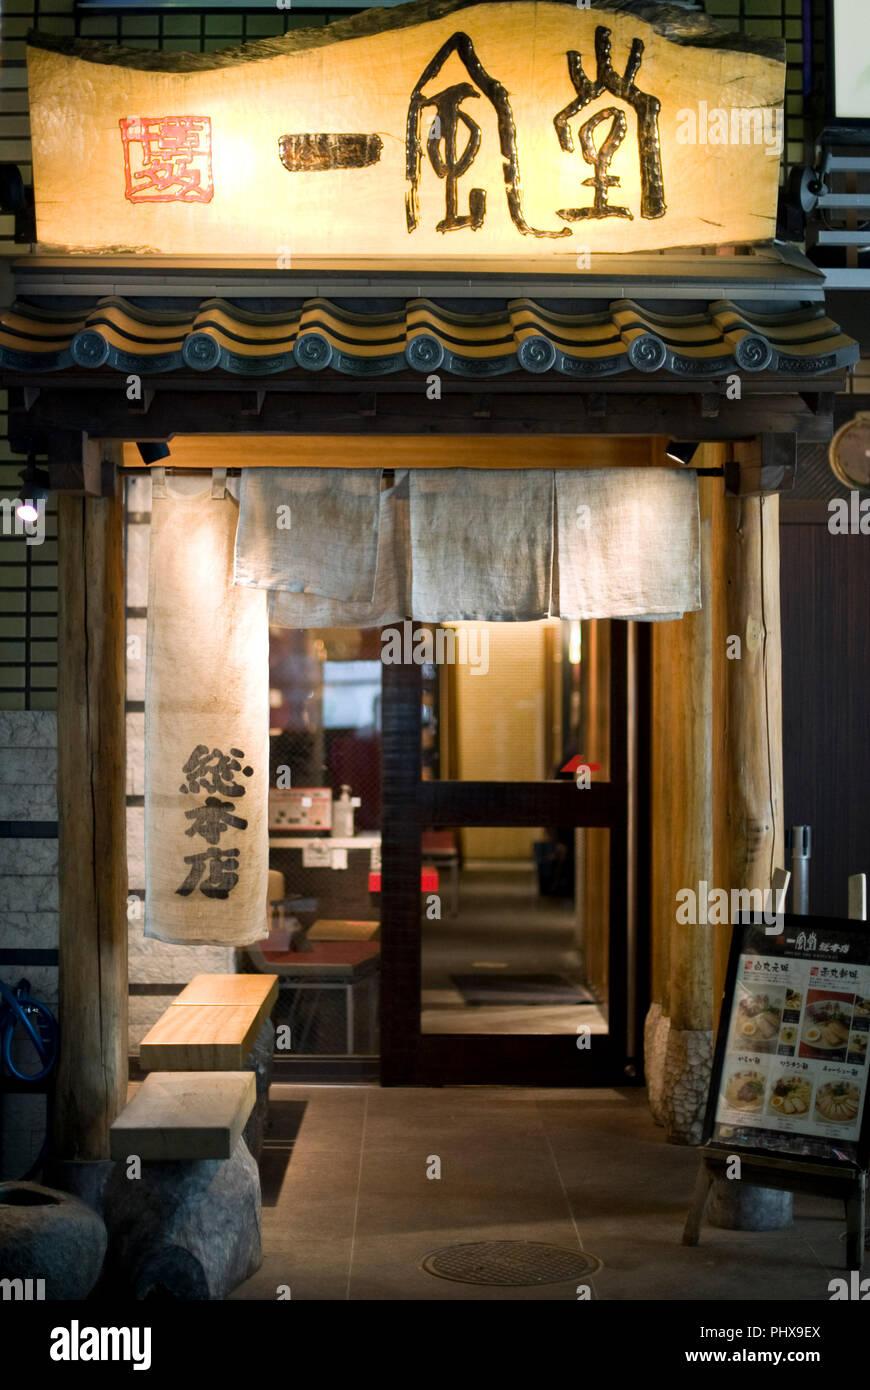 Photo shows the entrance to Hakata Ippudo Ramen's main store in the Daimyo district of Fukuoka City, Fukuoka Prefecture Japan on 08 March 2013.  The s - Stock Image